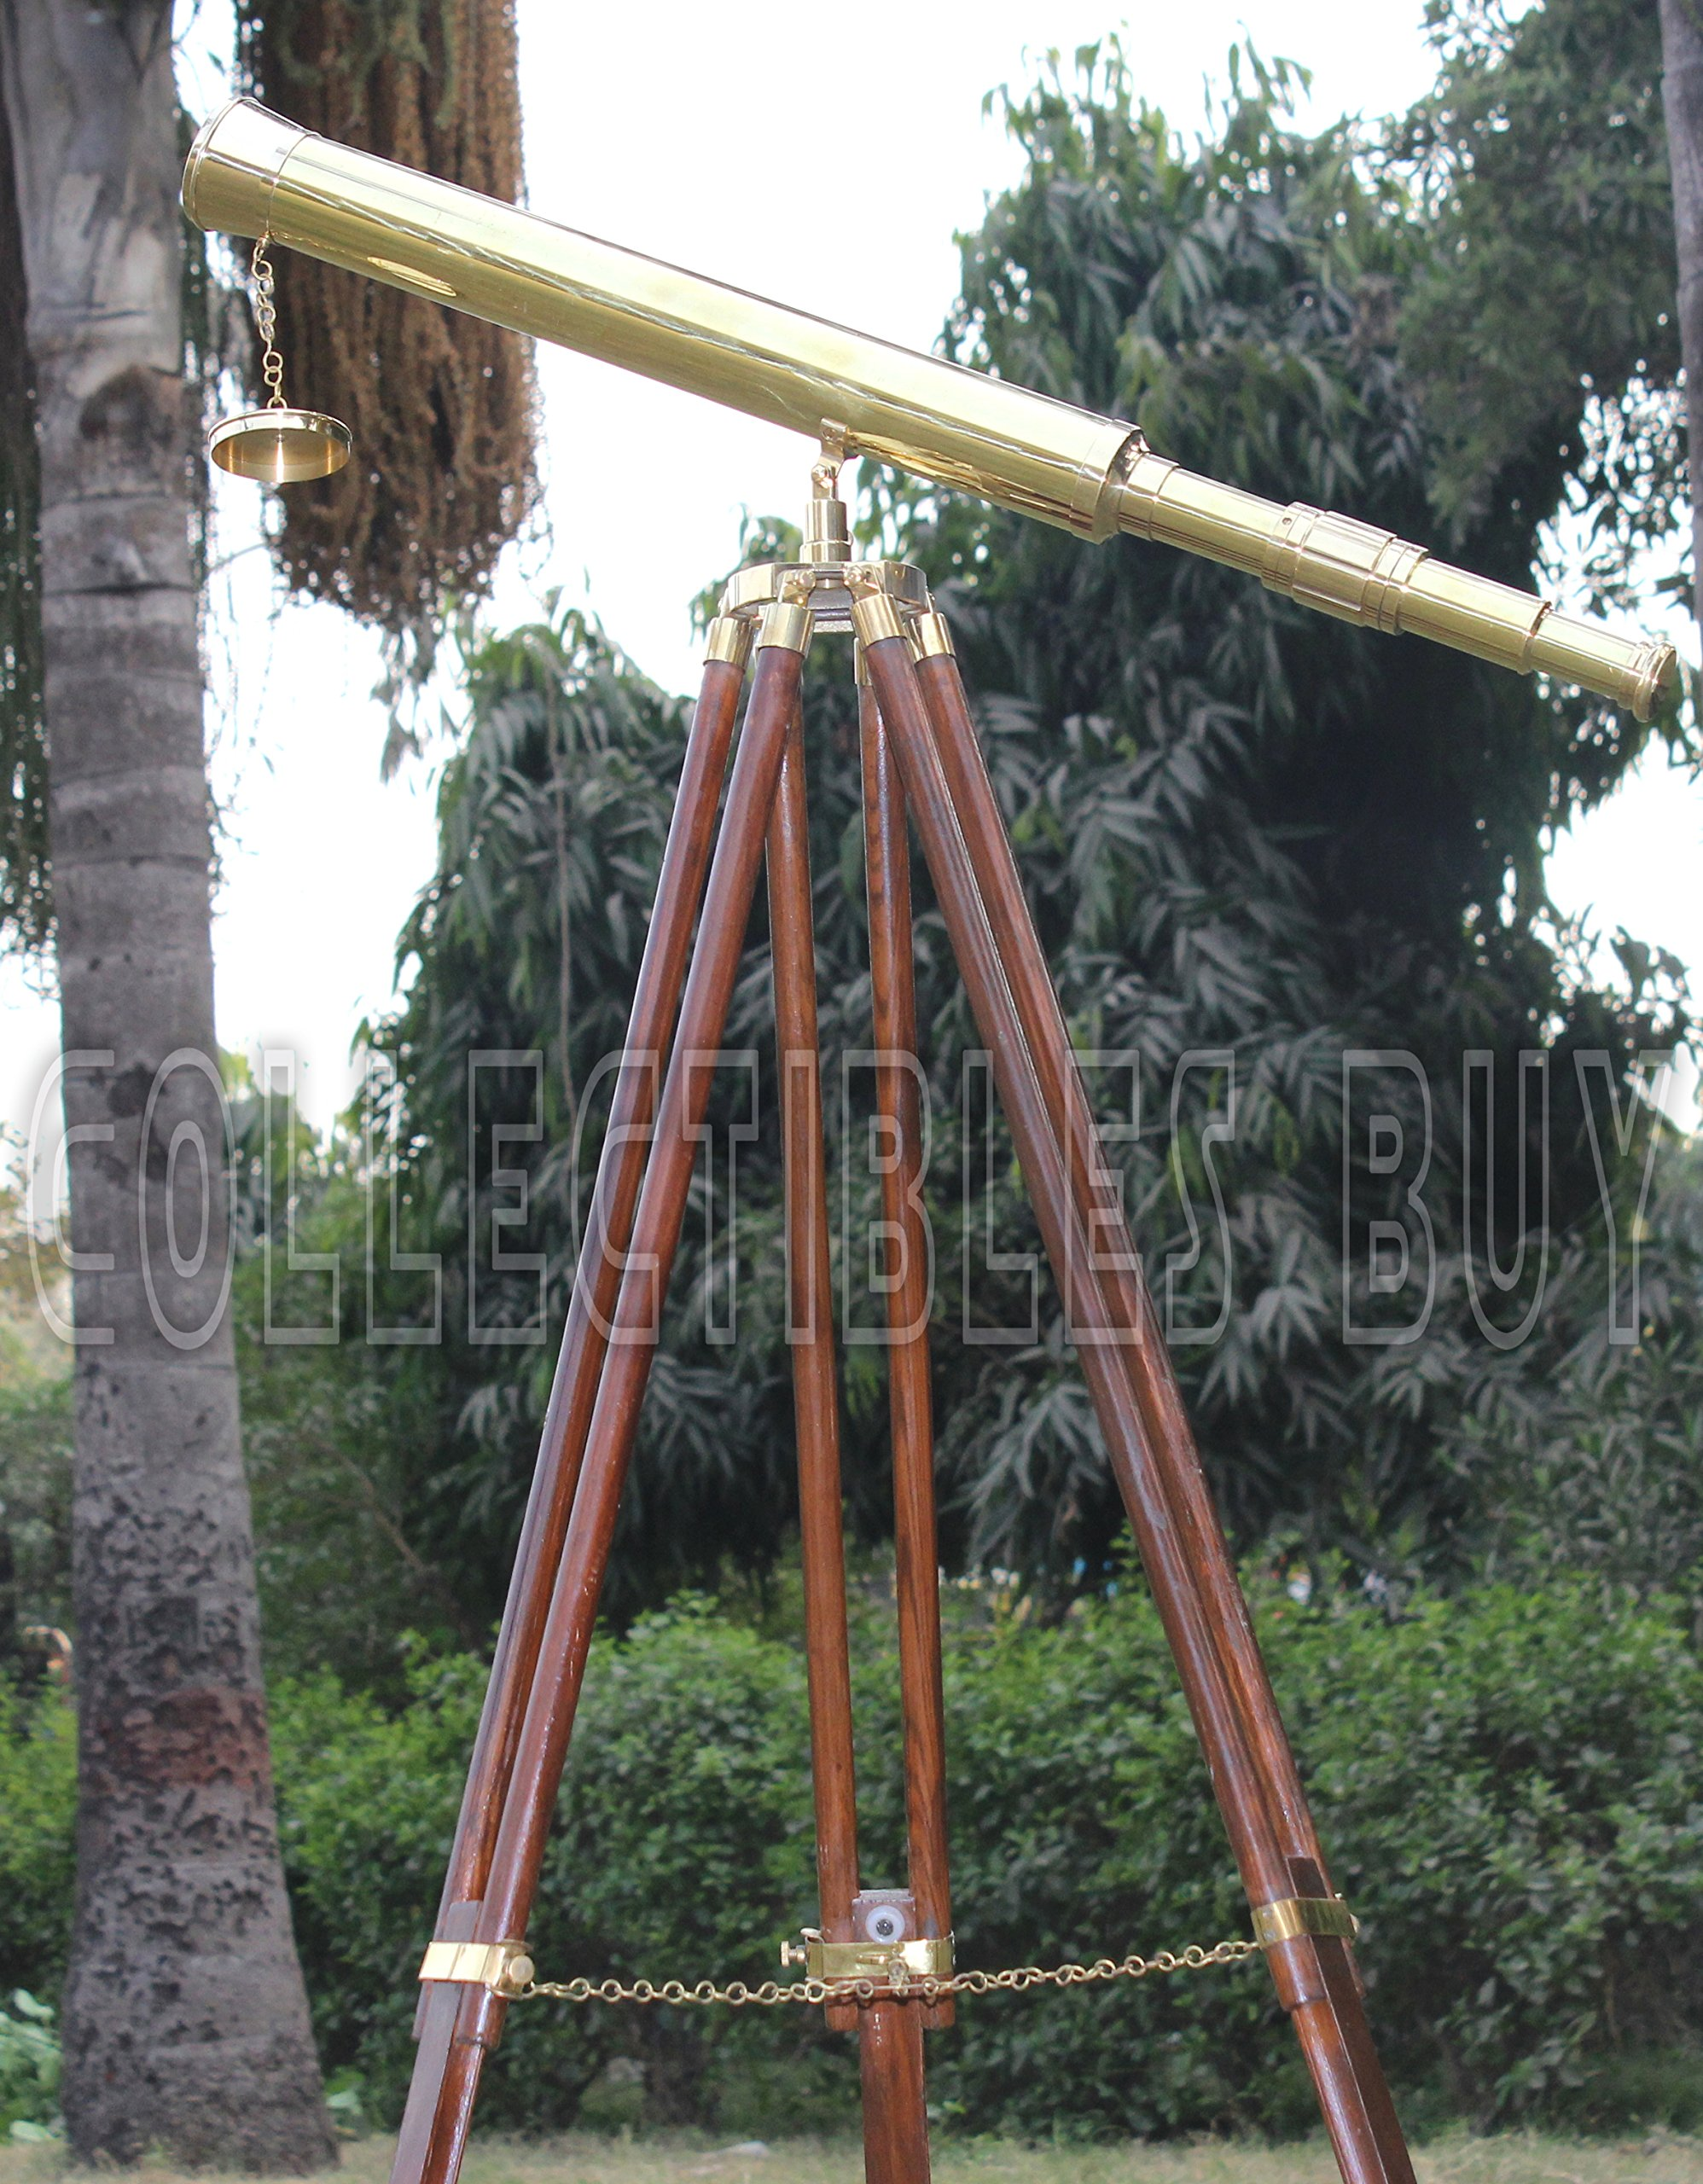 Shiny Brass Nautical Single Barrel Telescope Wooden Tripod Ideal Home Decor Brass Finish & Brown